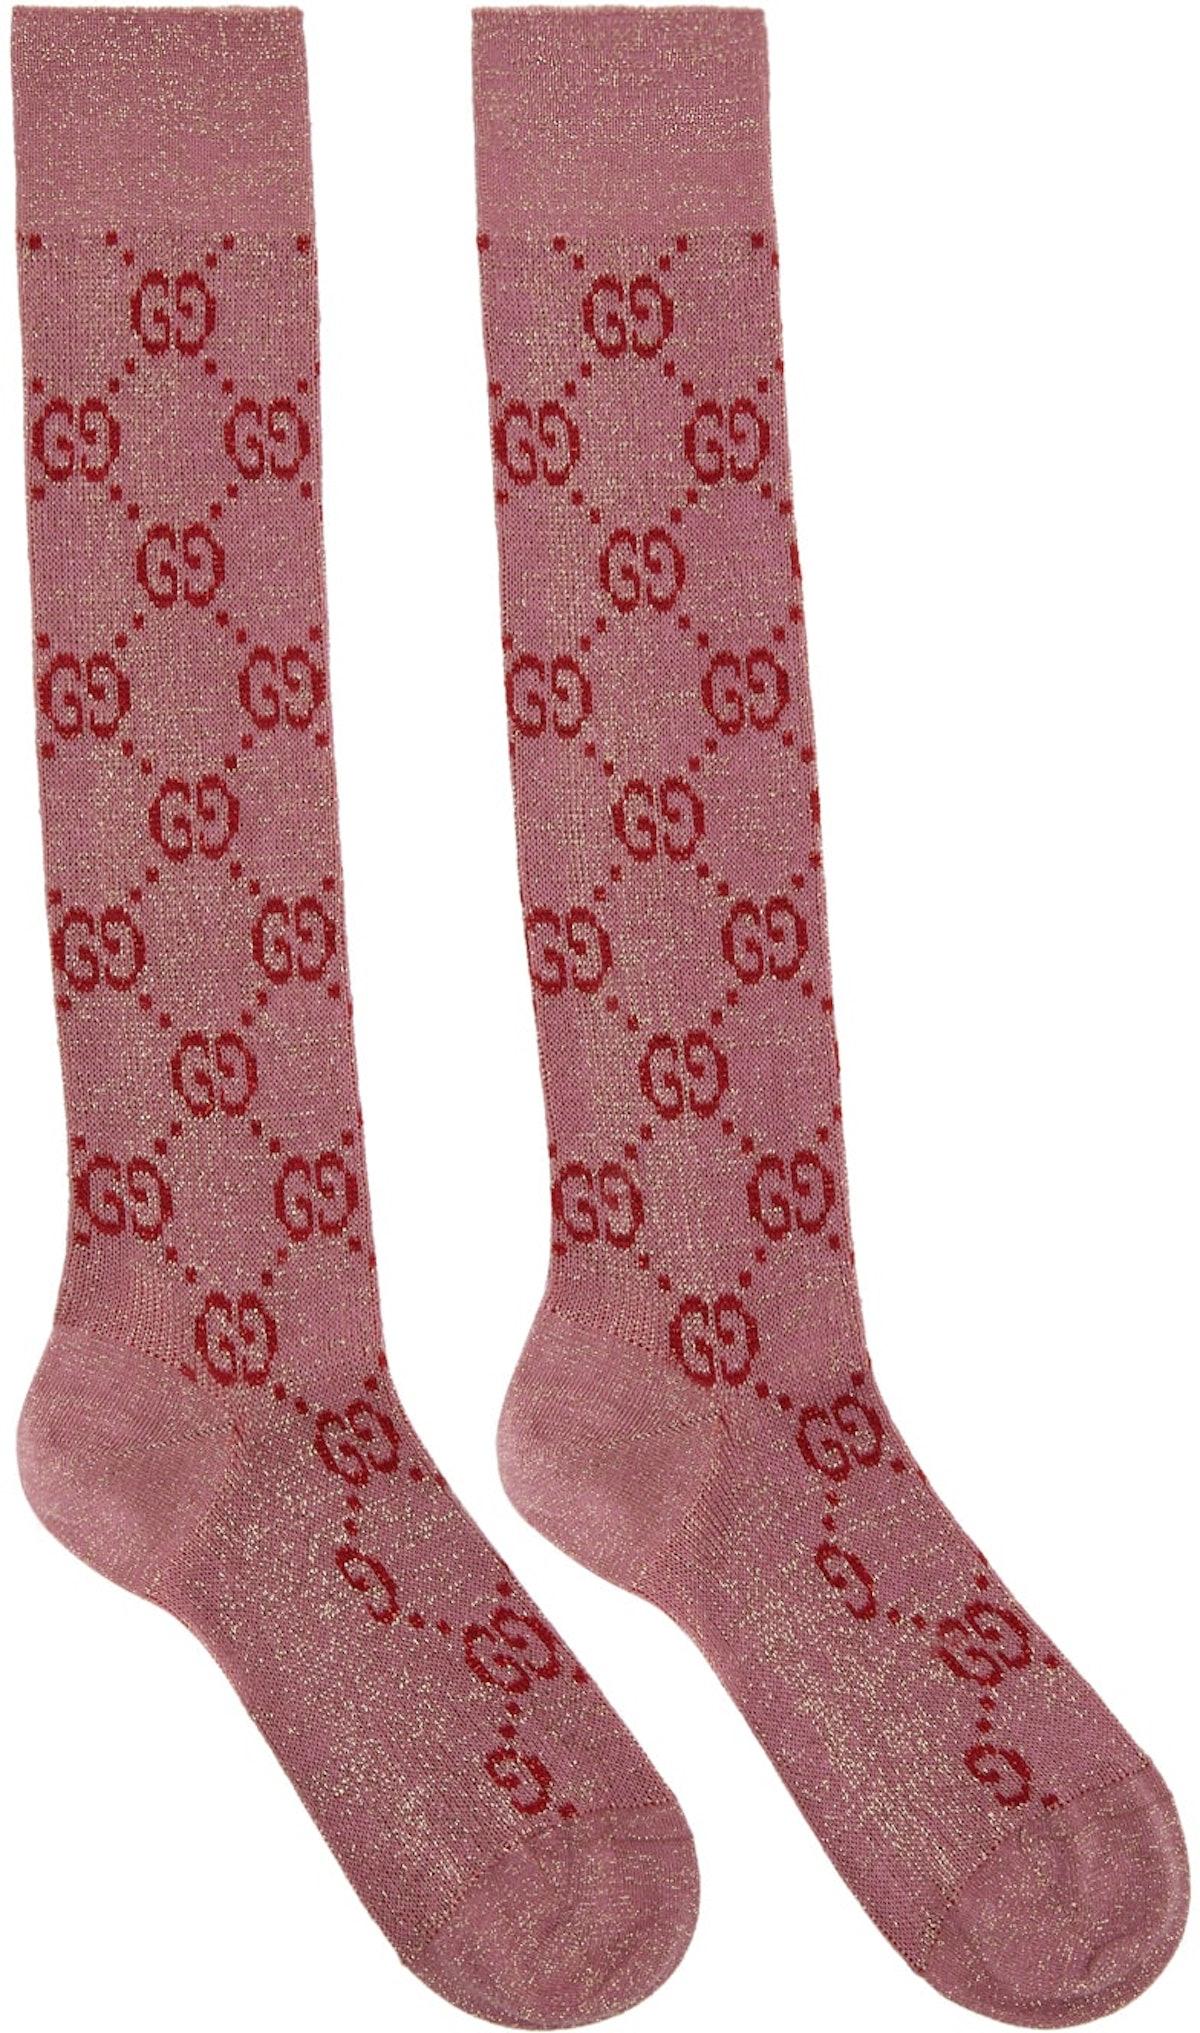 Pink & Red Lamé GG Socks